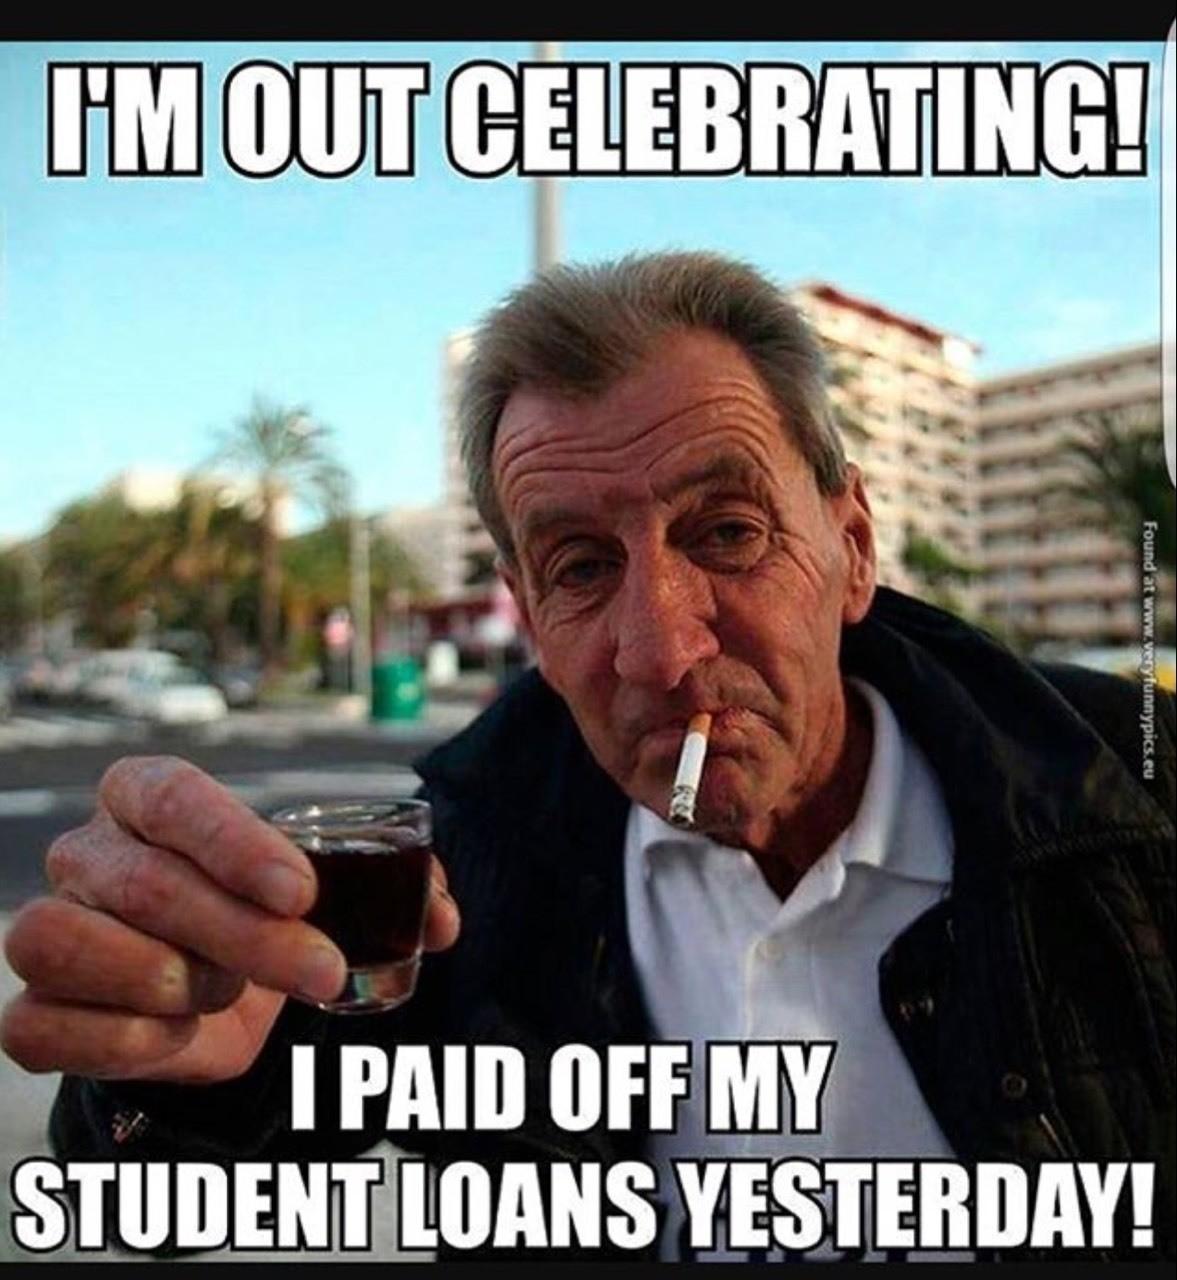 Oh Em Gee!!! We can help you. Click link in bio or go to www.myffu.com/ehriqa1 #StudentLoans #GetOutOfDebt #InvestInYourself #ChangeYourLife